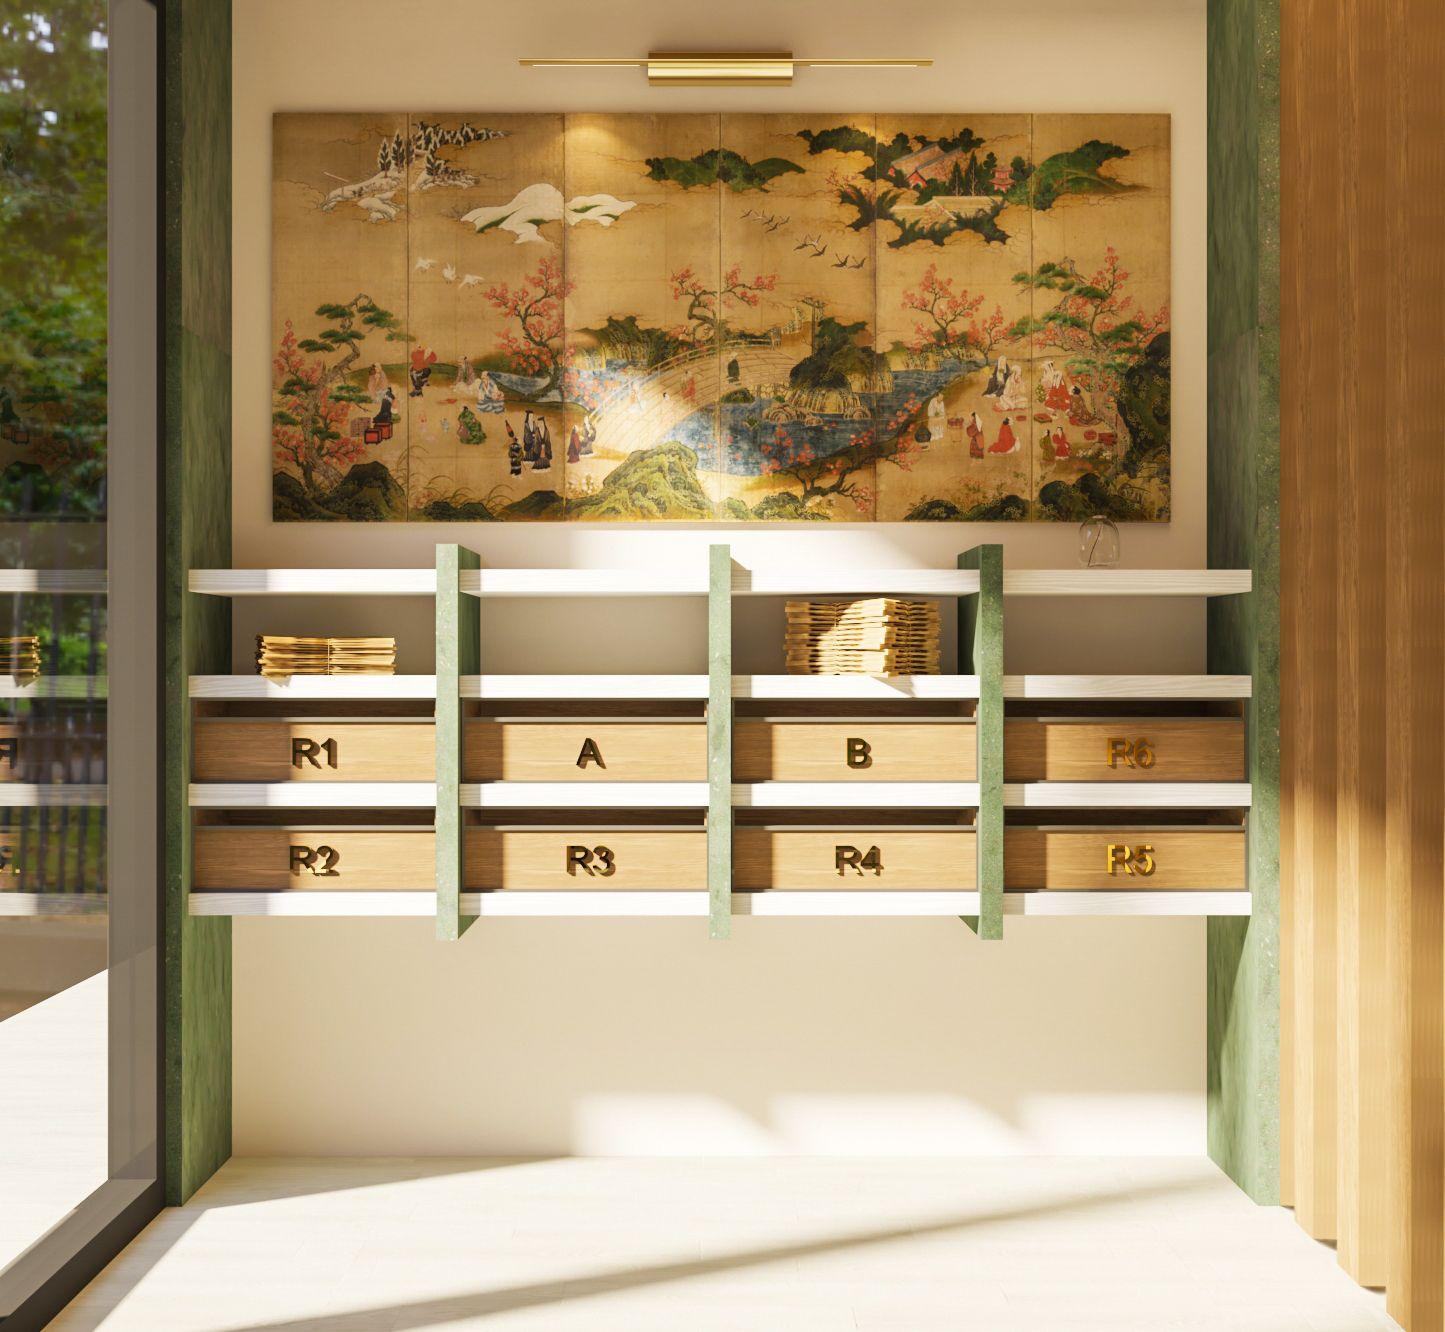 Himawari Residence - Lobby Mail Area